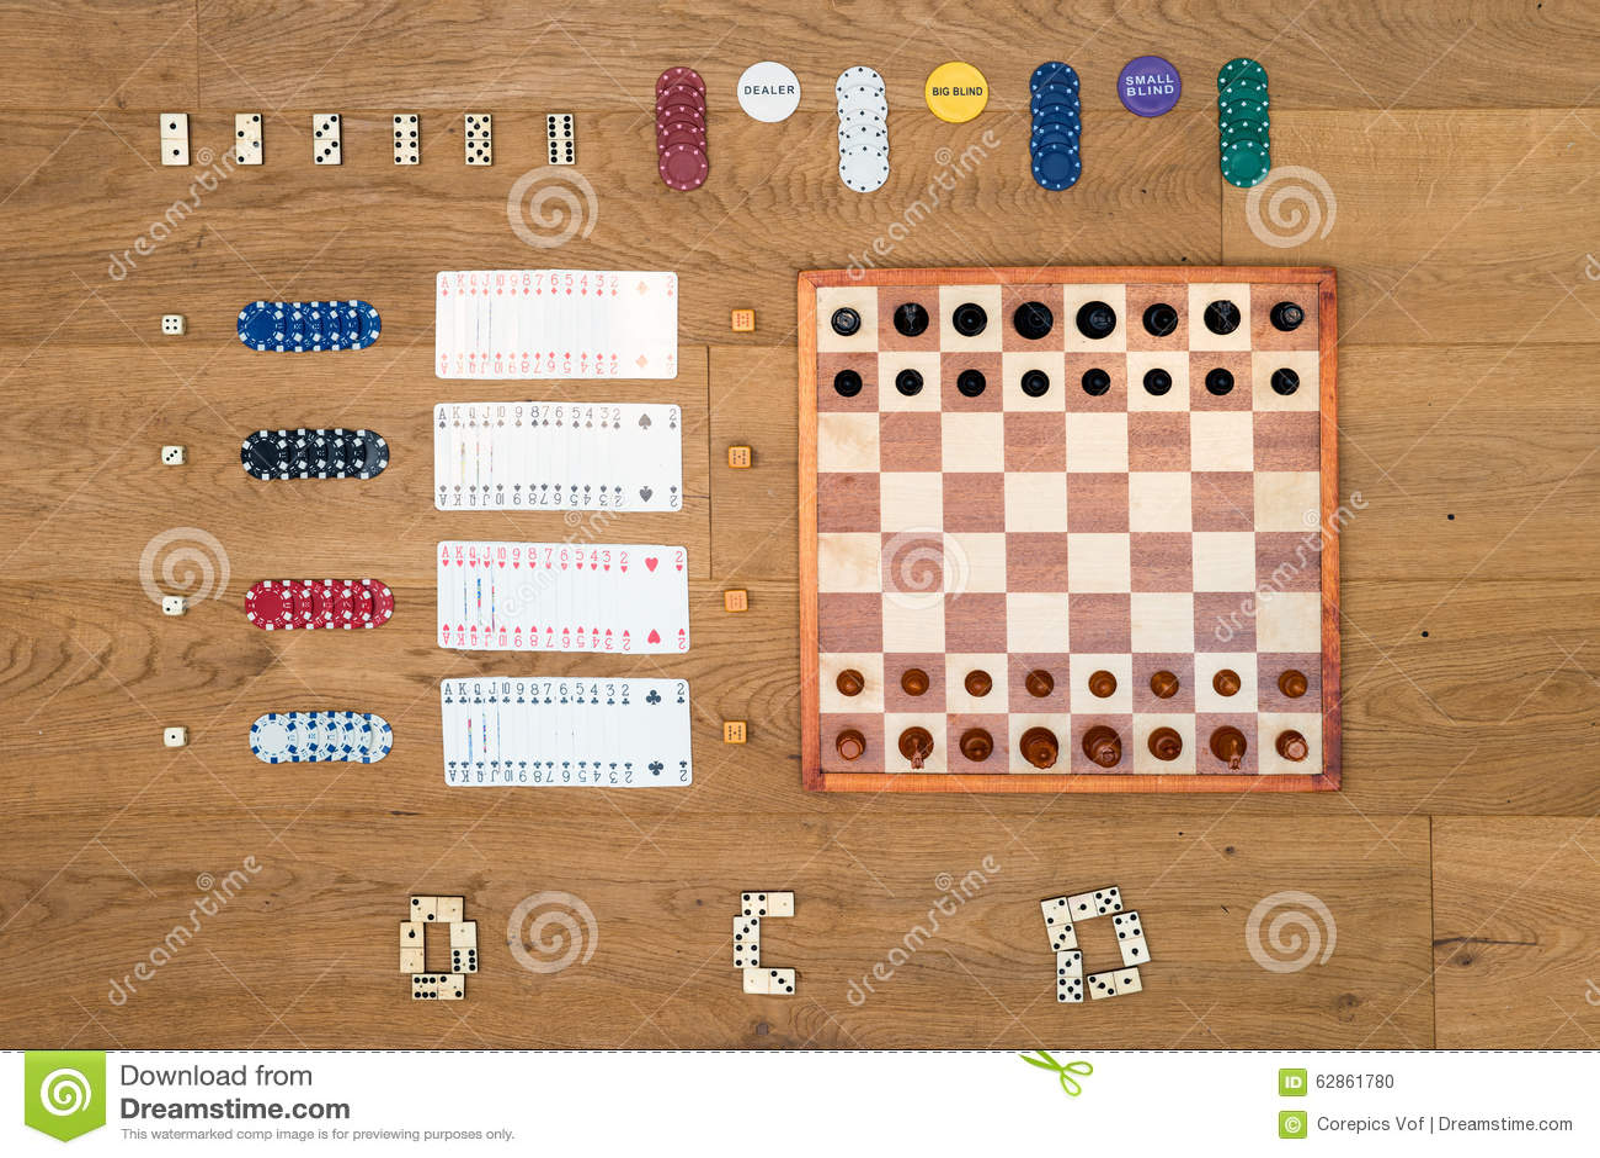 Board games gambling 500 best bonus casino free payouts